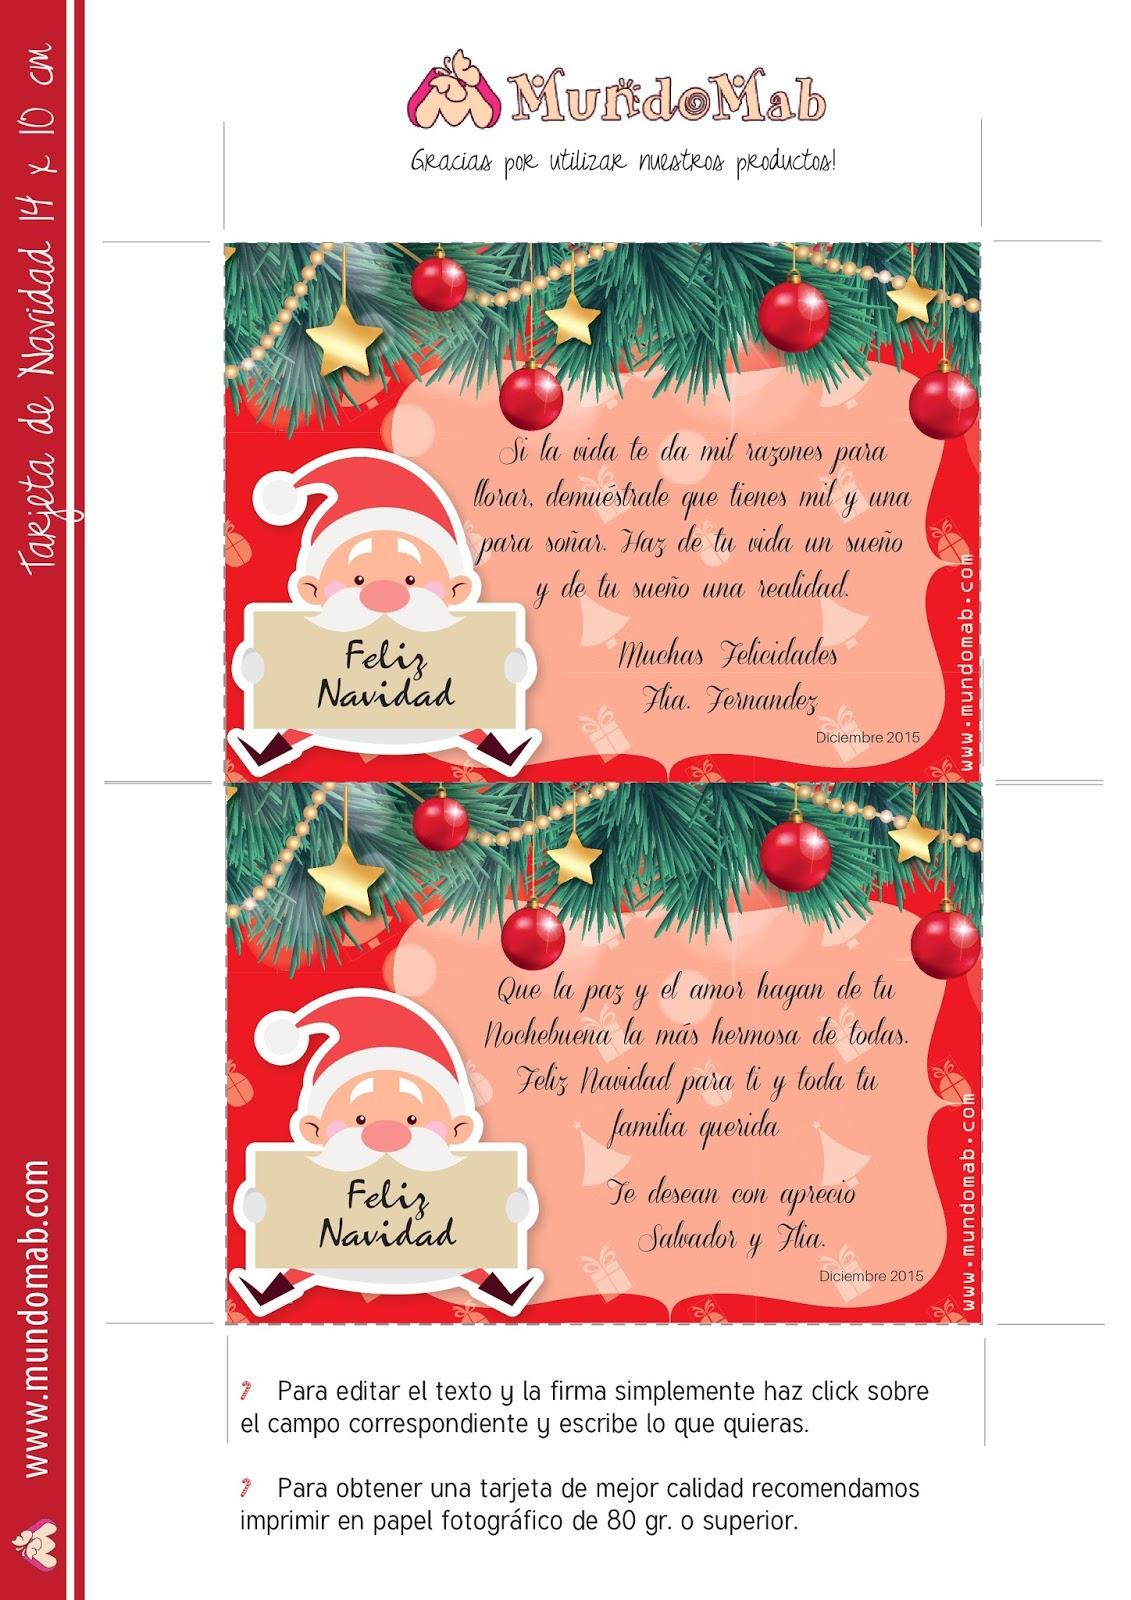 5 tarjetas navide as para editar imprimir y regalar On imagenes navidenas gratis para imprimir